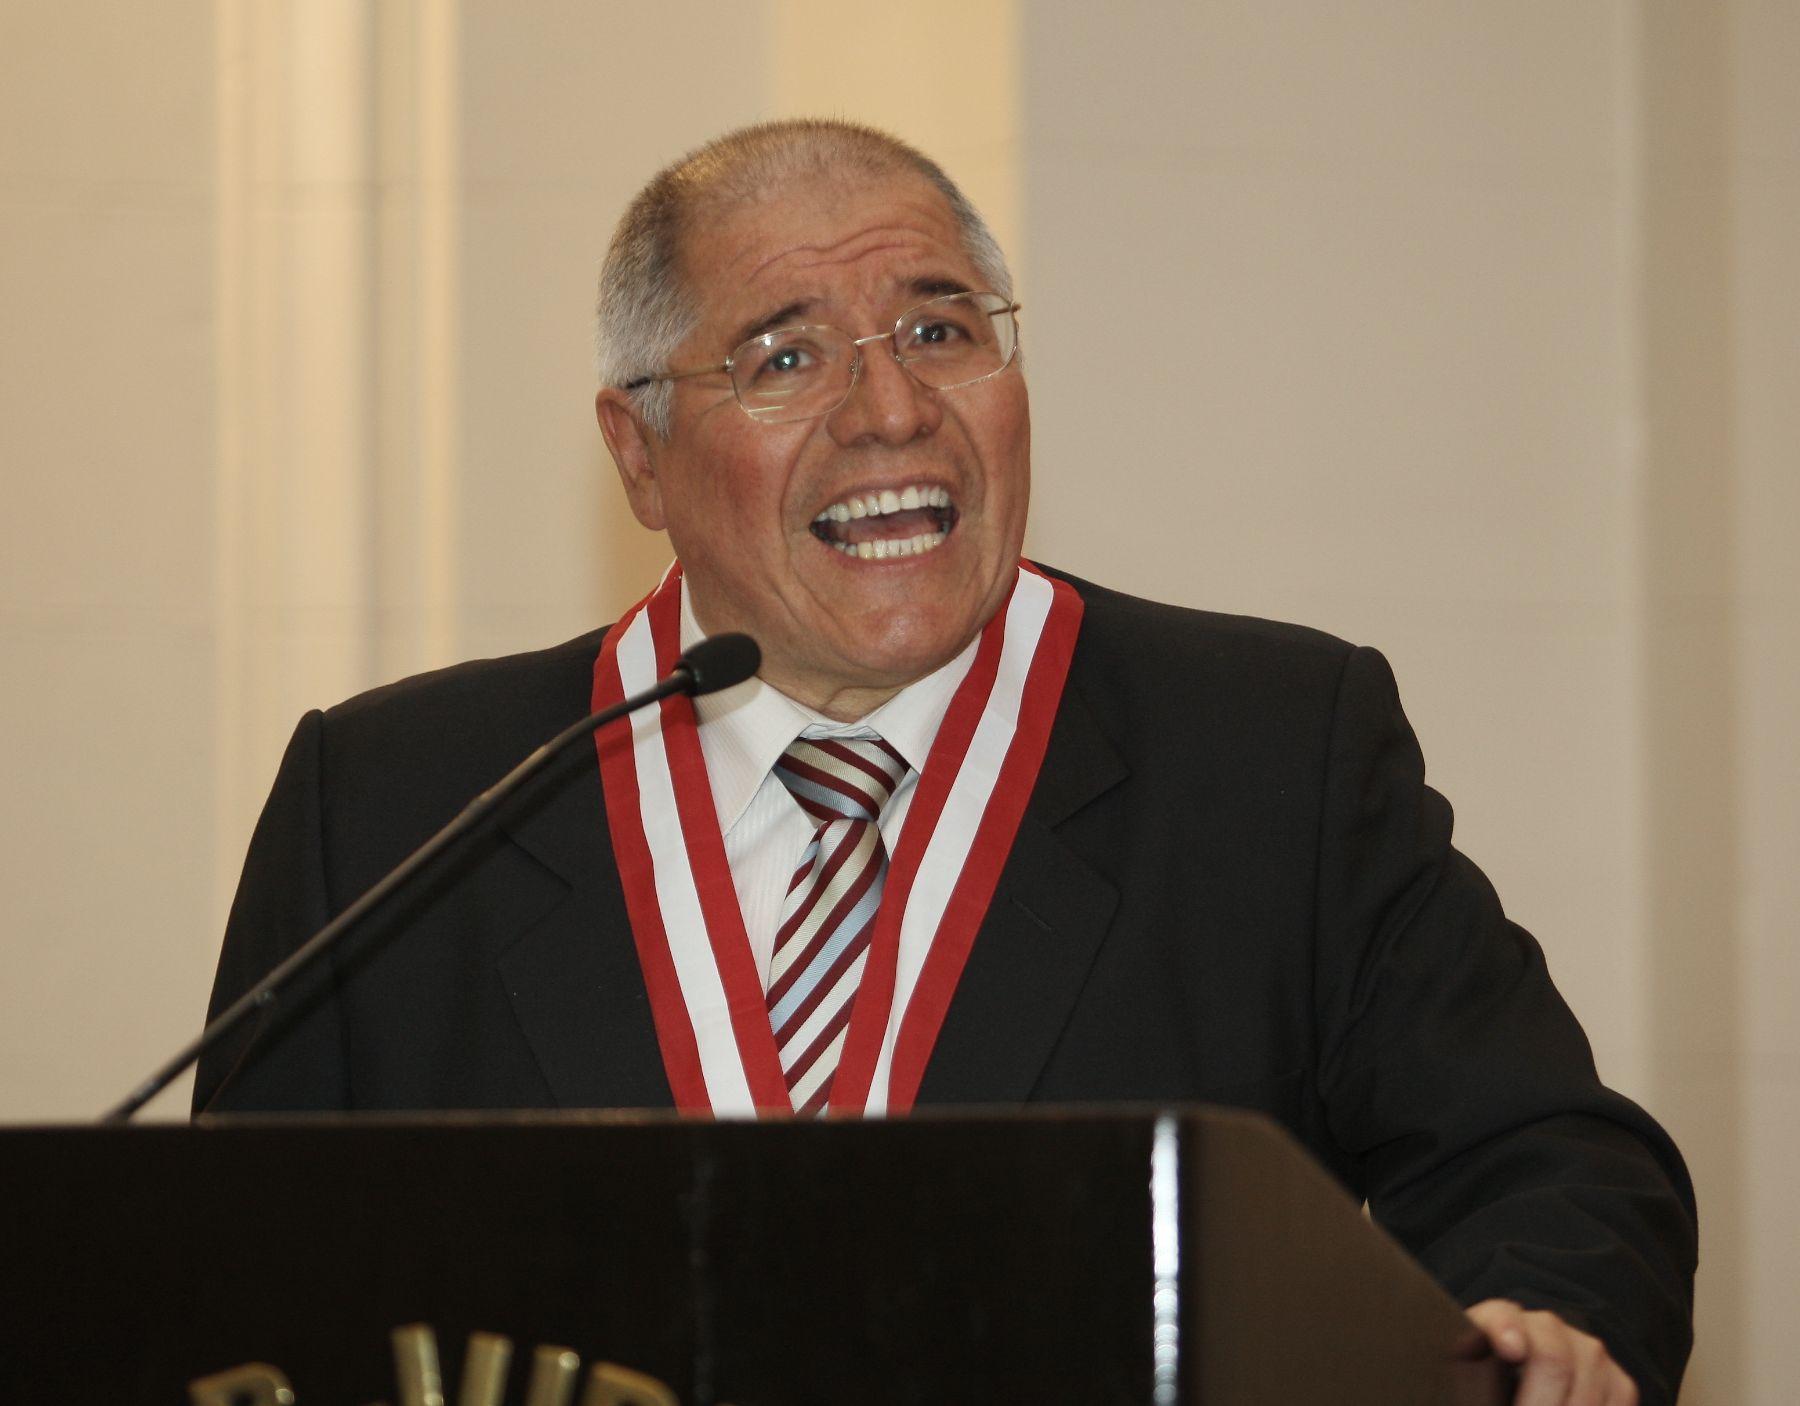 Juez Supremo, César San Martin Castro, magistrado Coordinador del V Pleno Jurisdiccional Penal. Foto: ANDINA/Norman Córdova